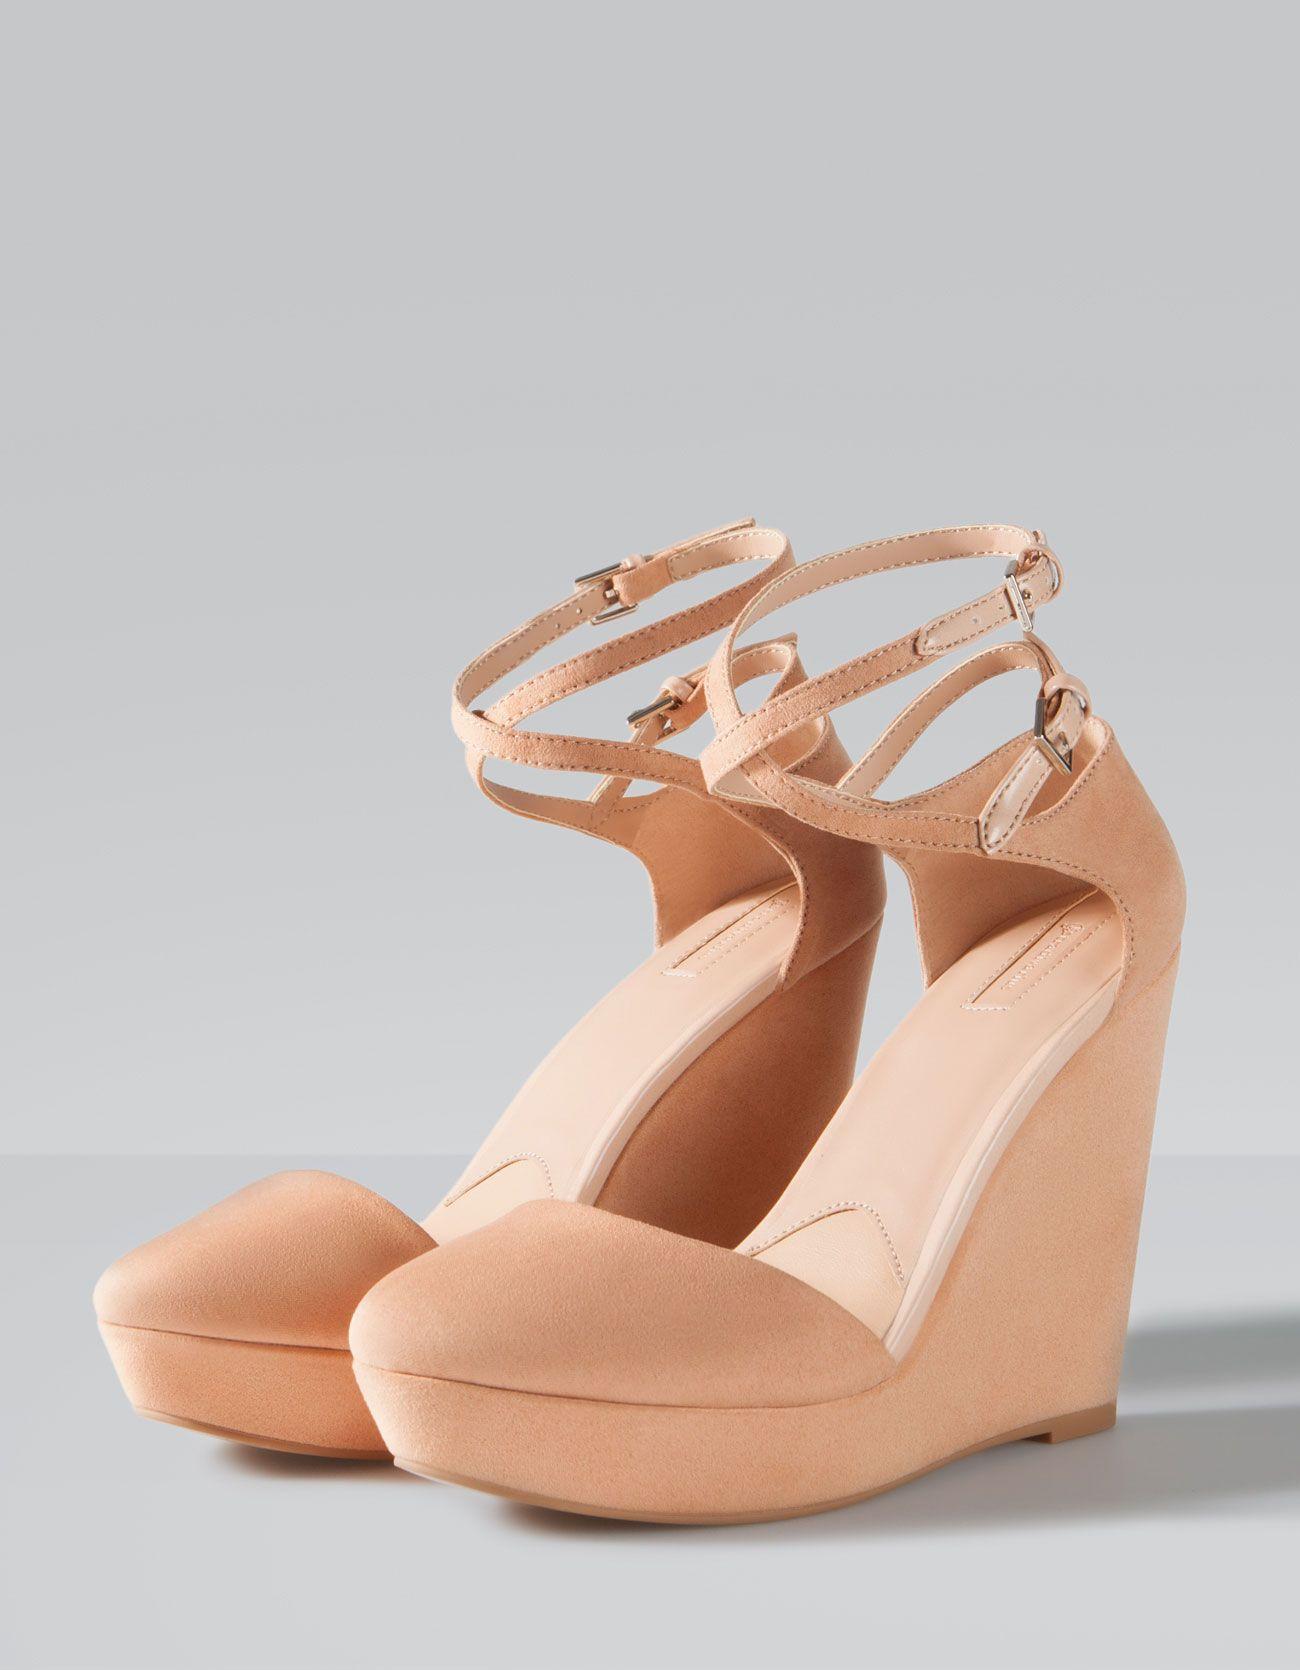 Stradivarius Buty Z Paskami Na Koturnie I Platformie Shoes Lace Up Wedges